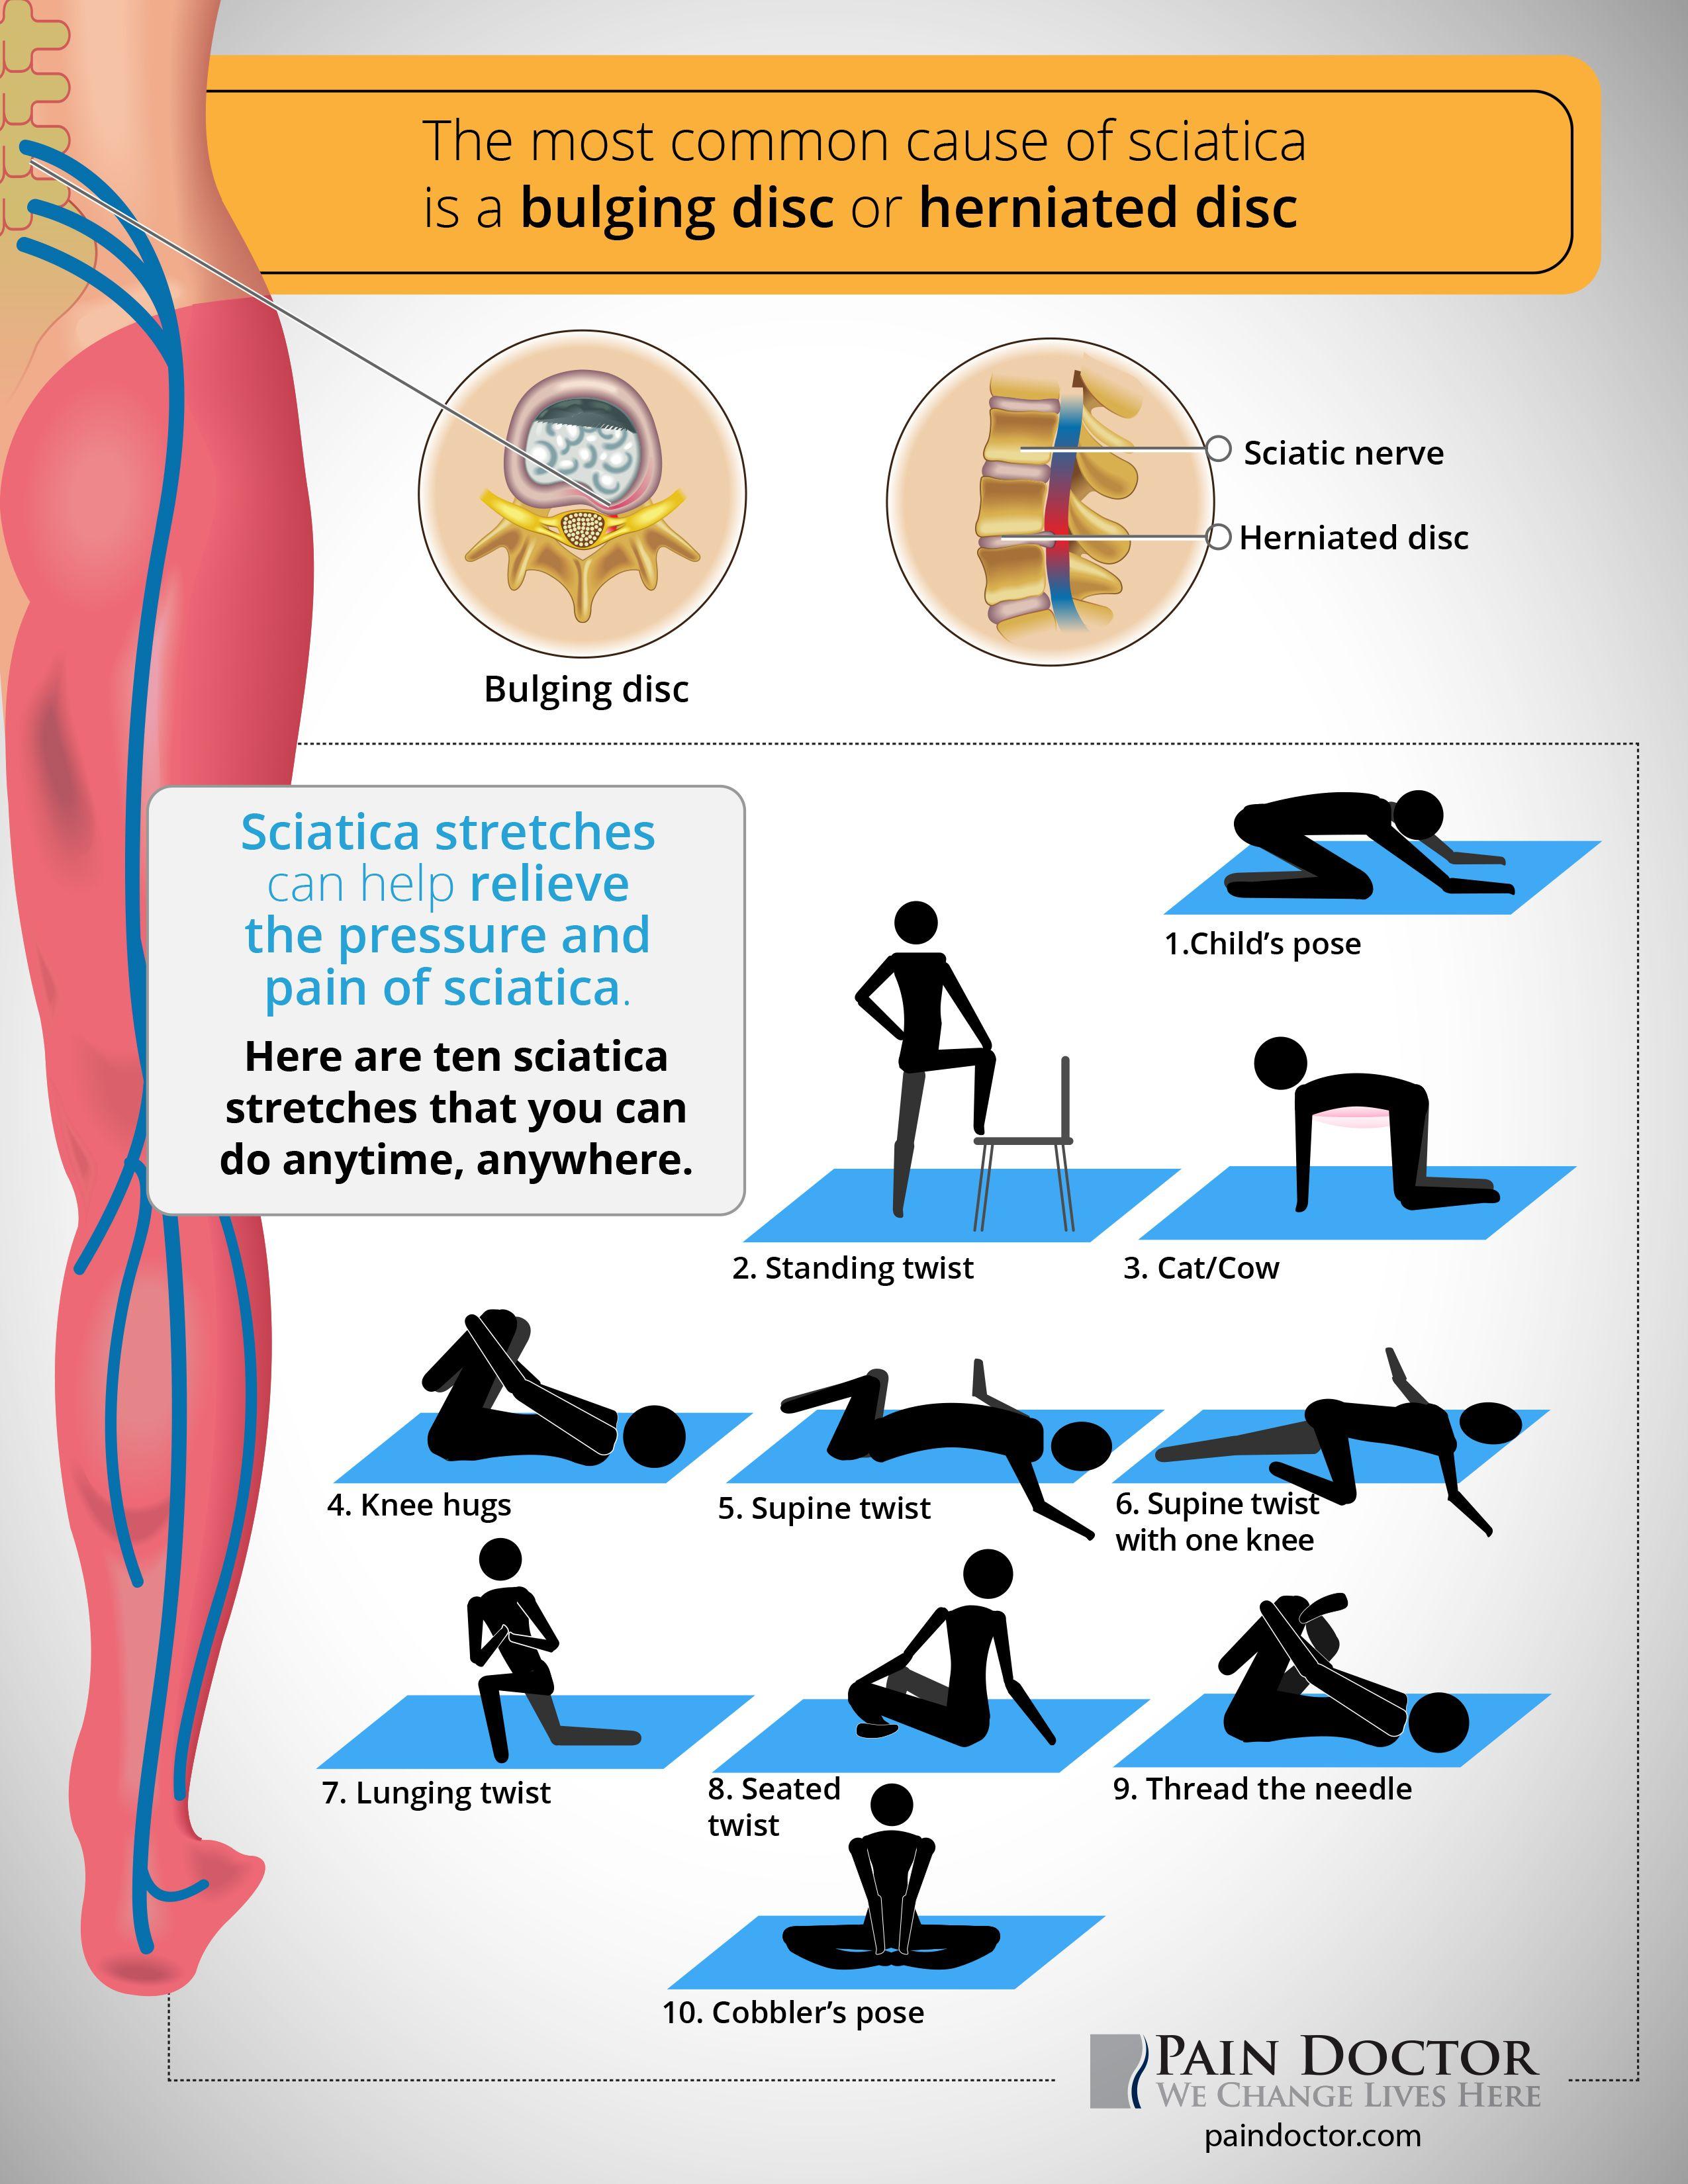 If You Have Sciaticpain What Sciatica Stretches Help